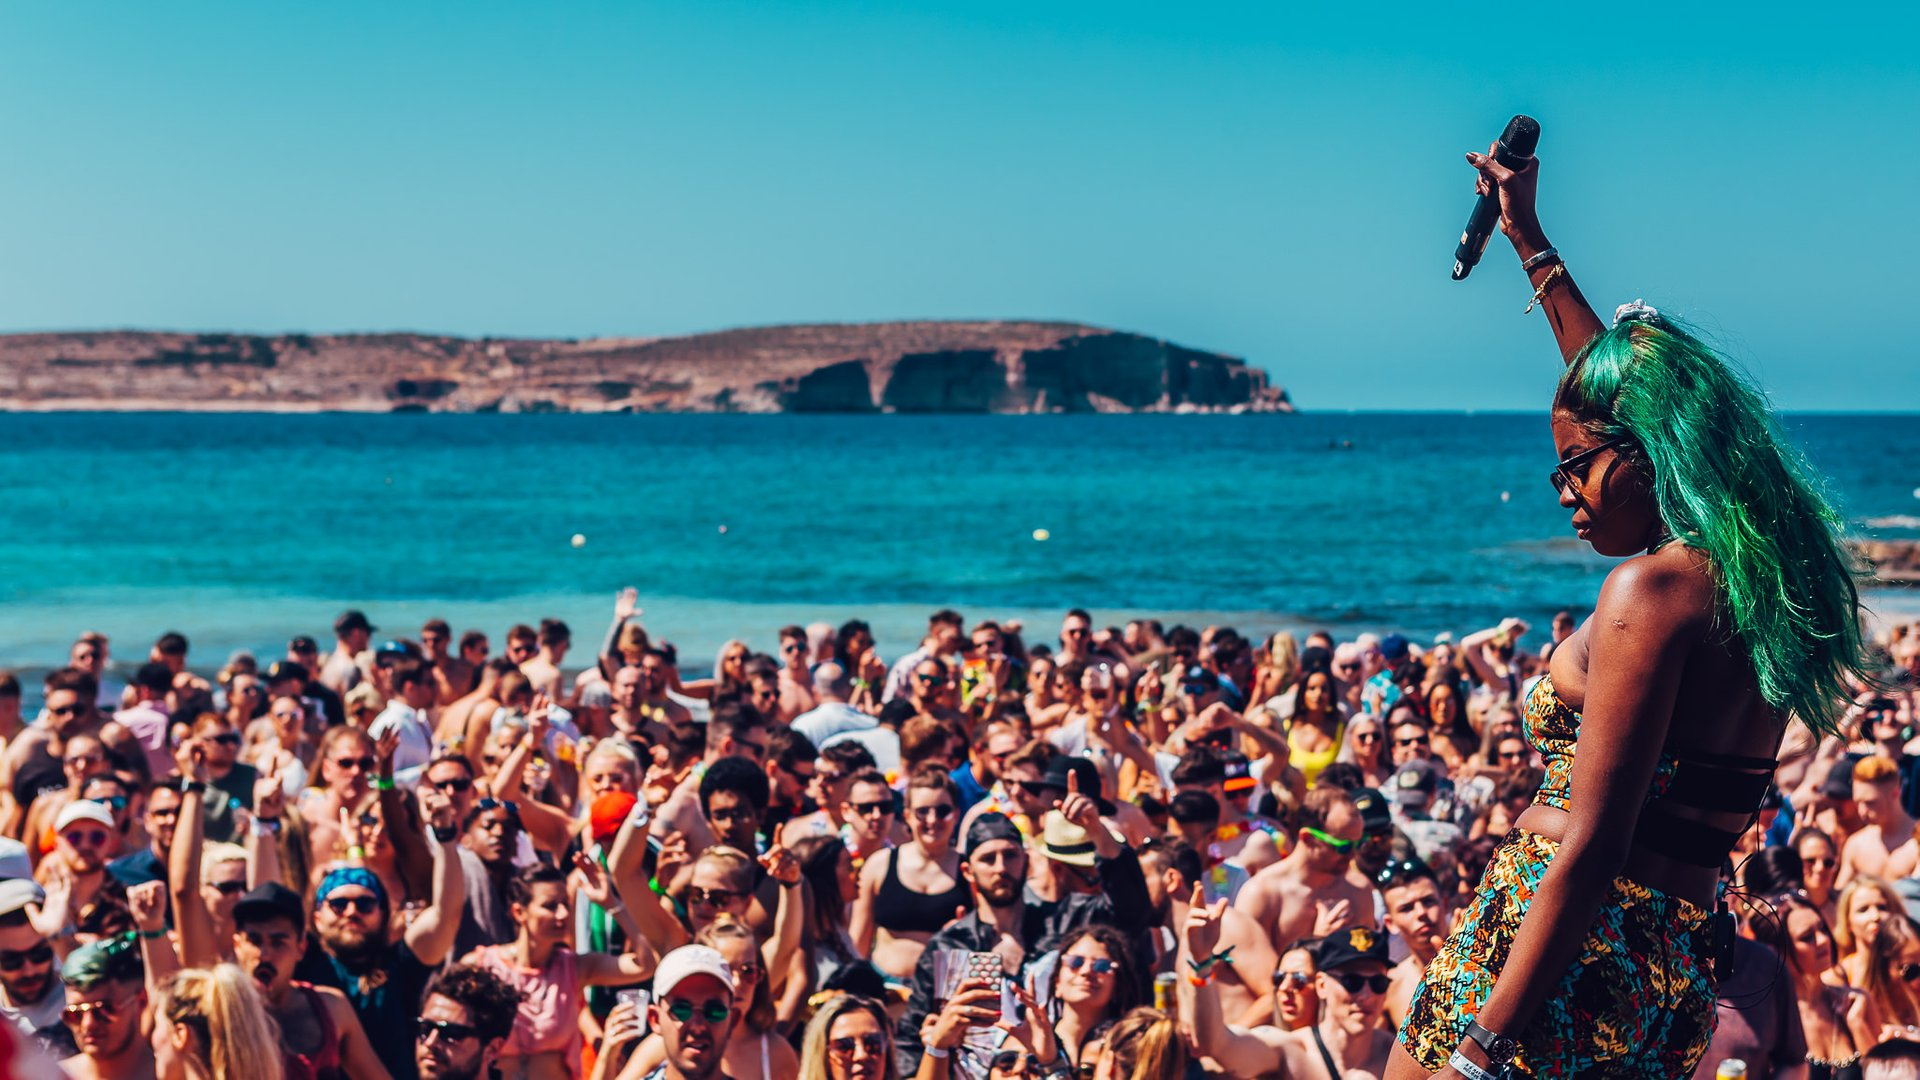 Lost & Found Festival in Malta - Best Season 2020